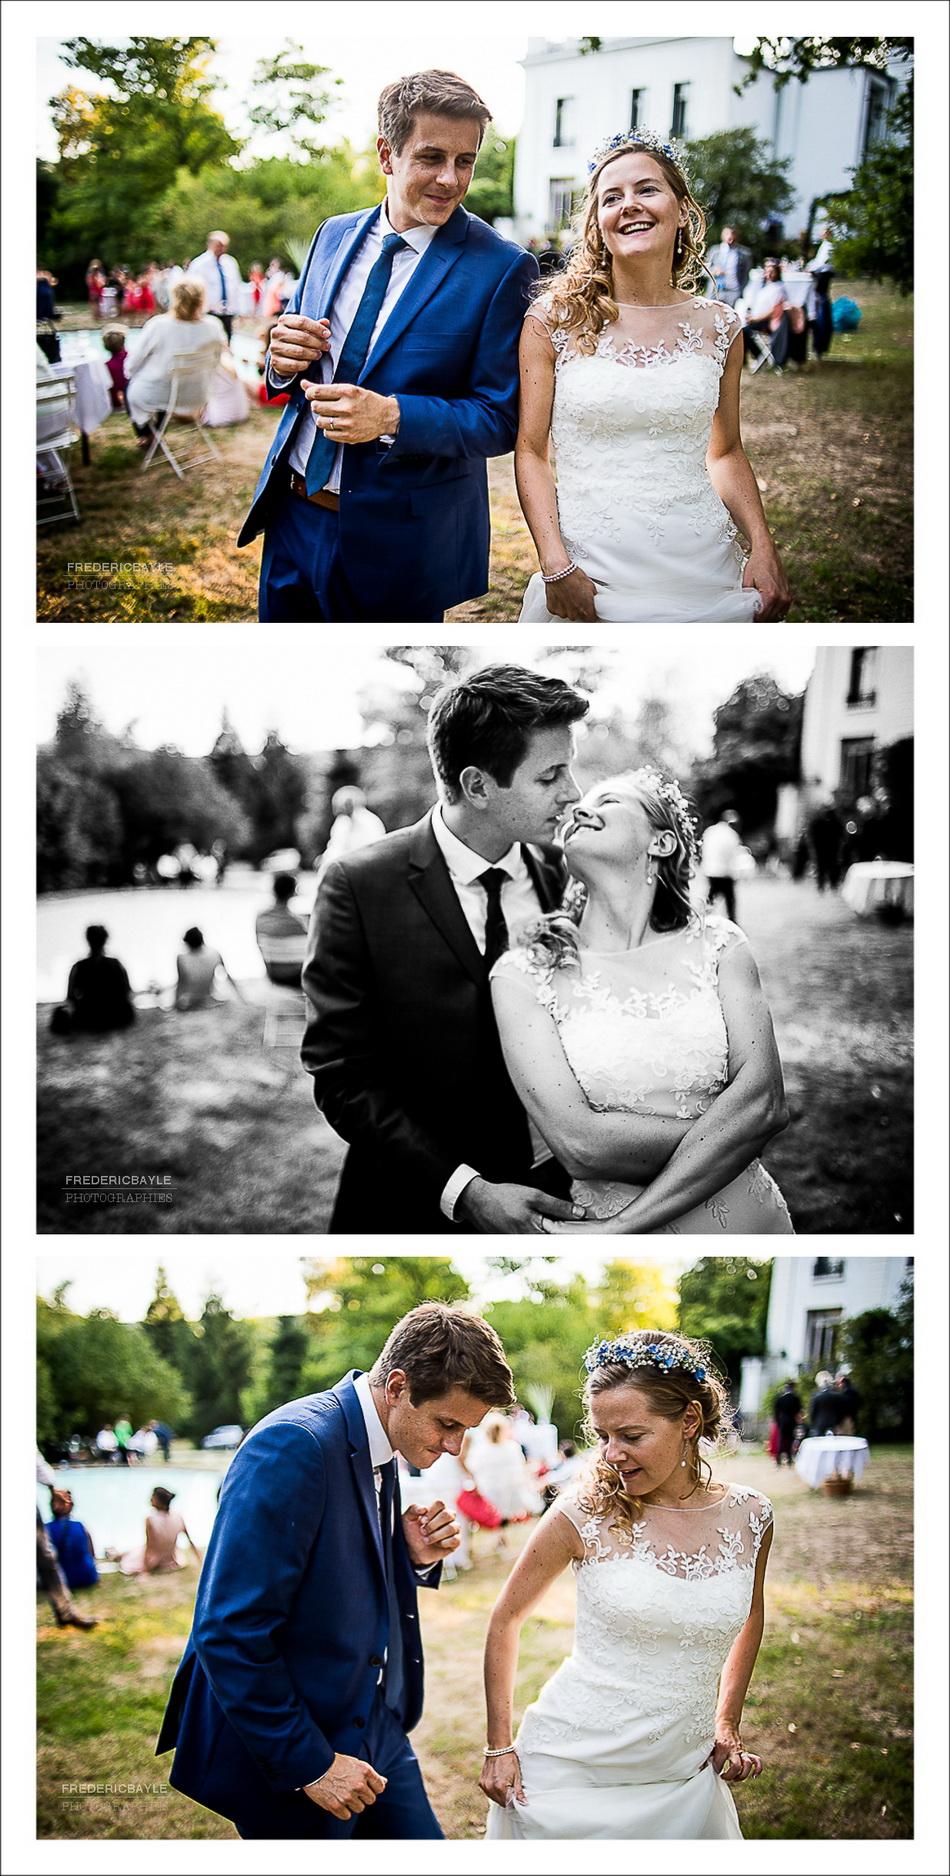 mariage-maison-blanche-etienne-brunel-53